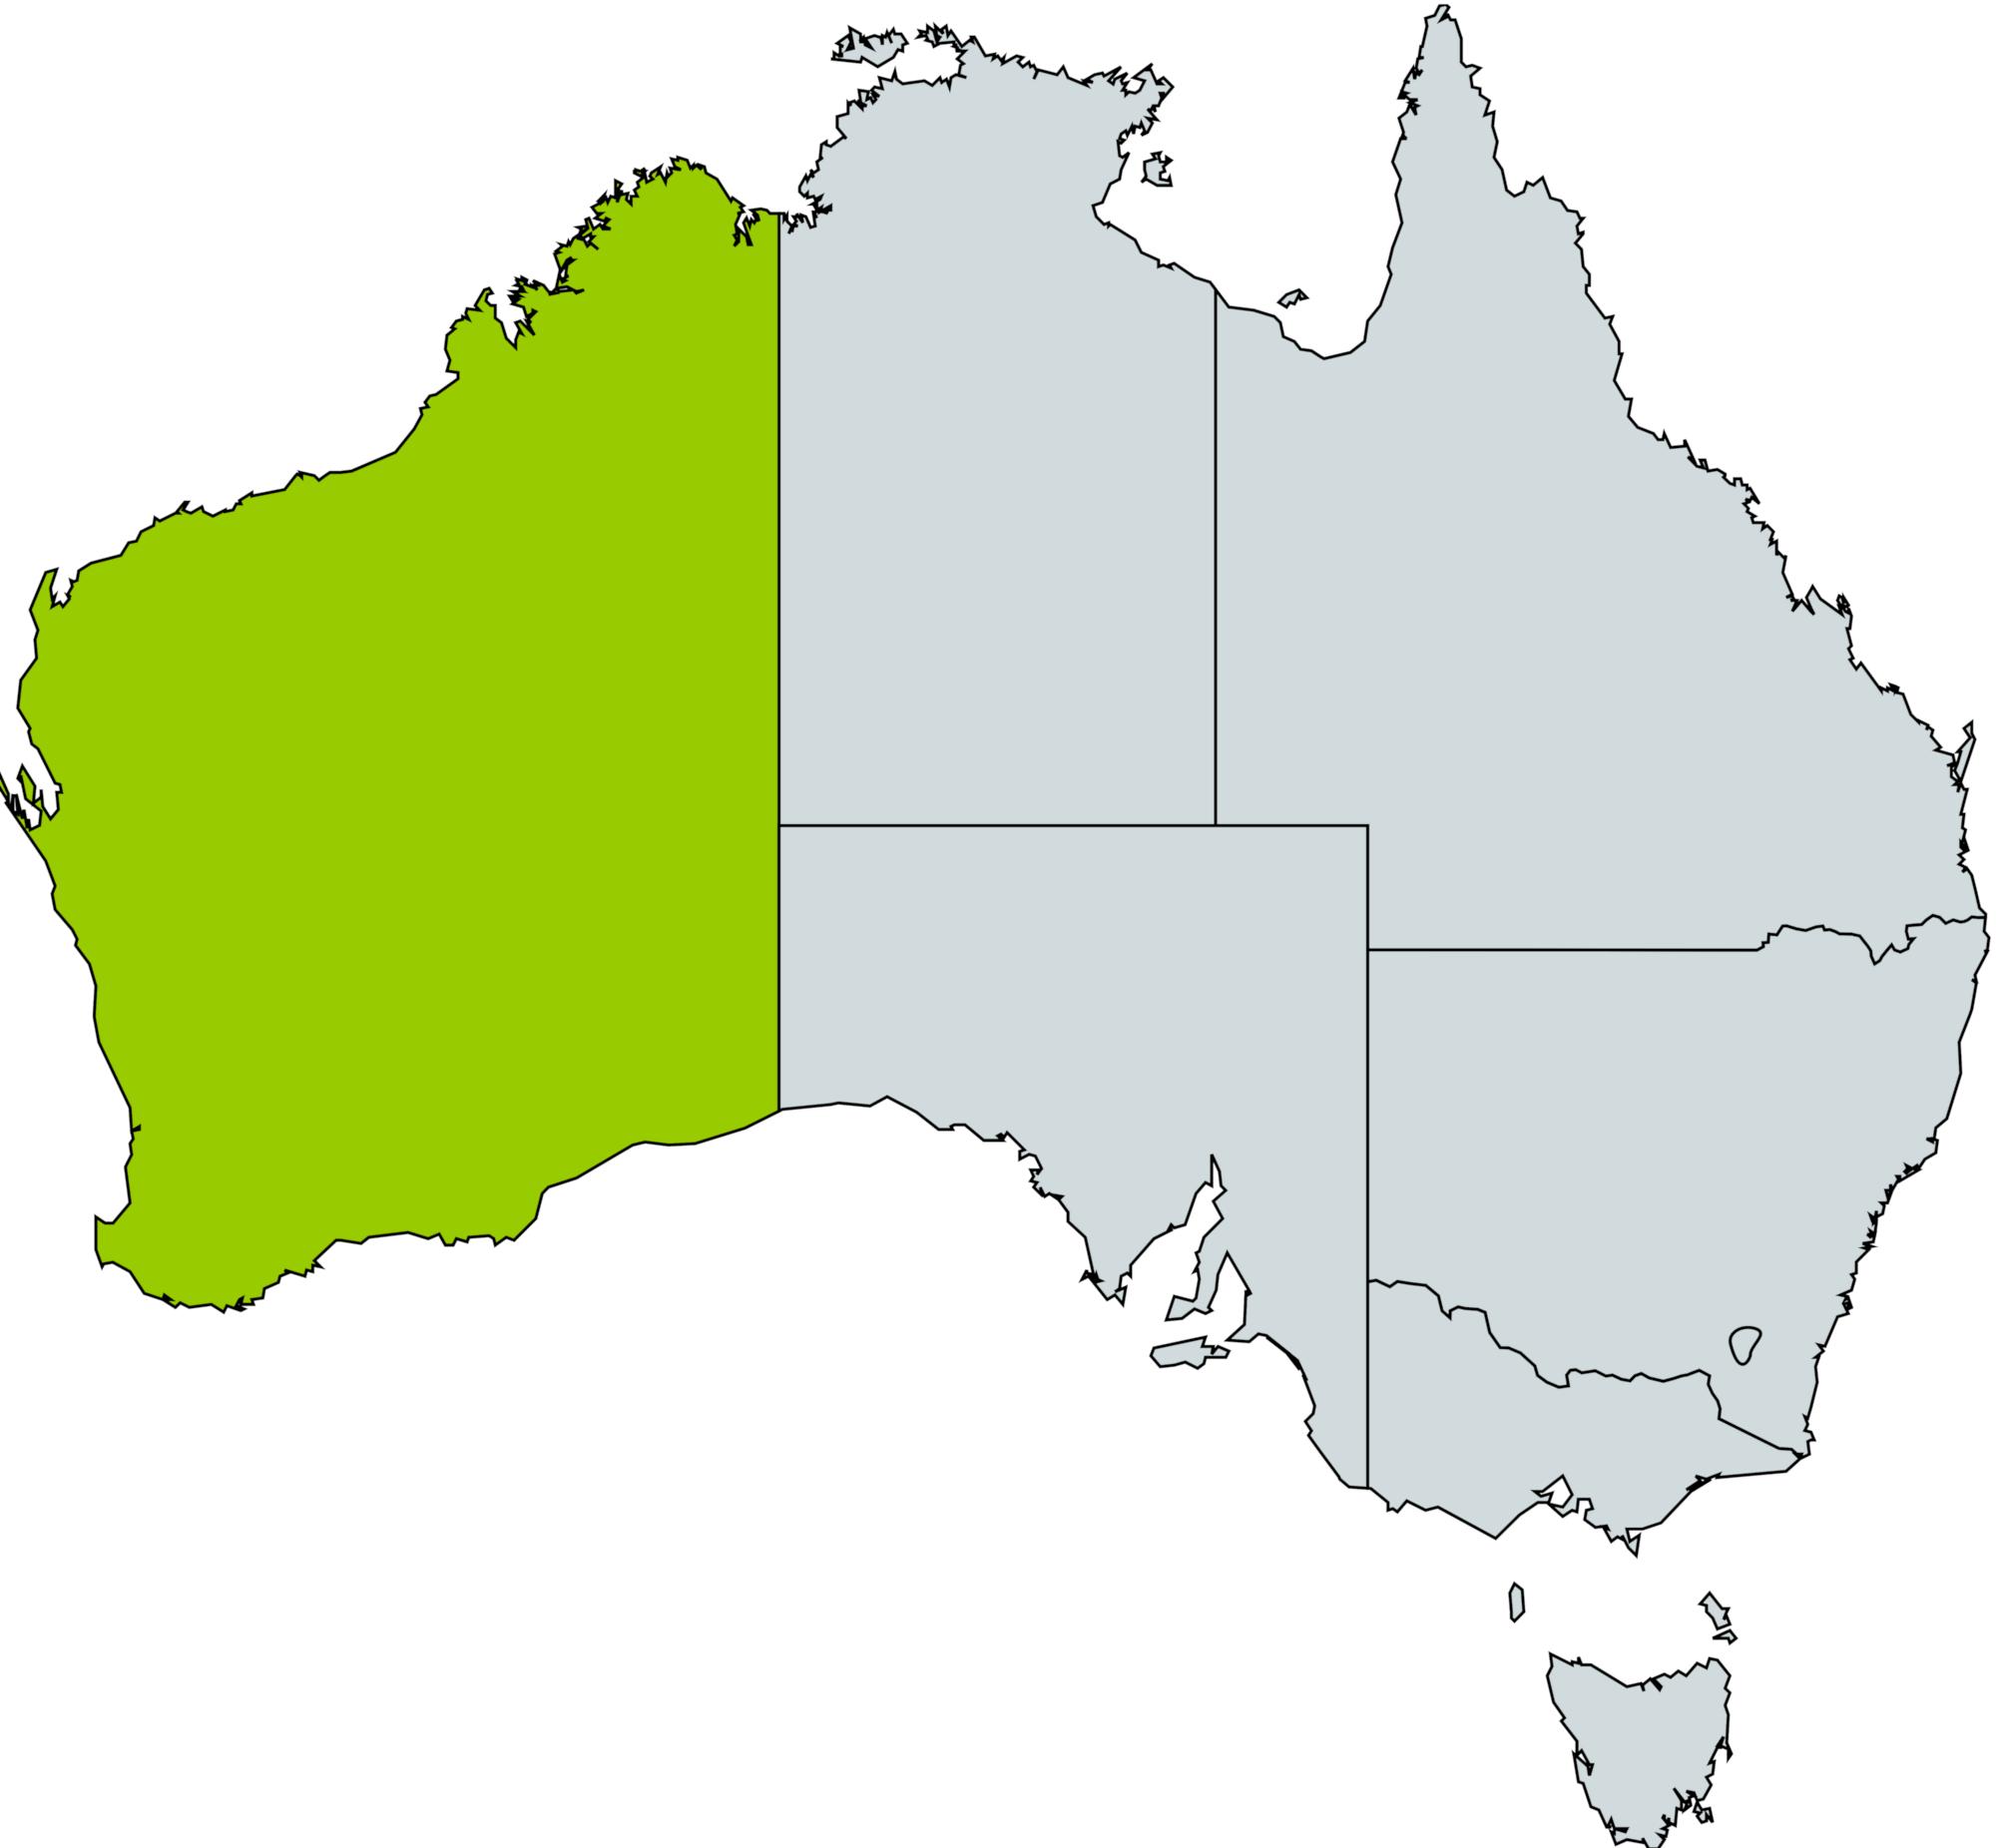 Map Of Western Australia 26th Parallel.Apply Teach Learn Grow